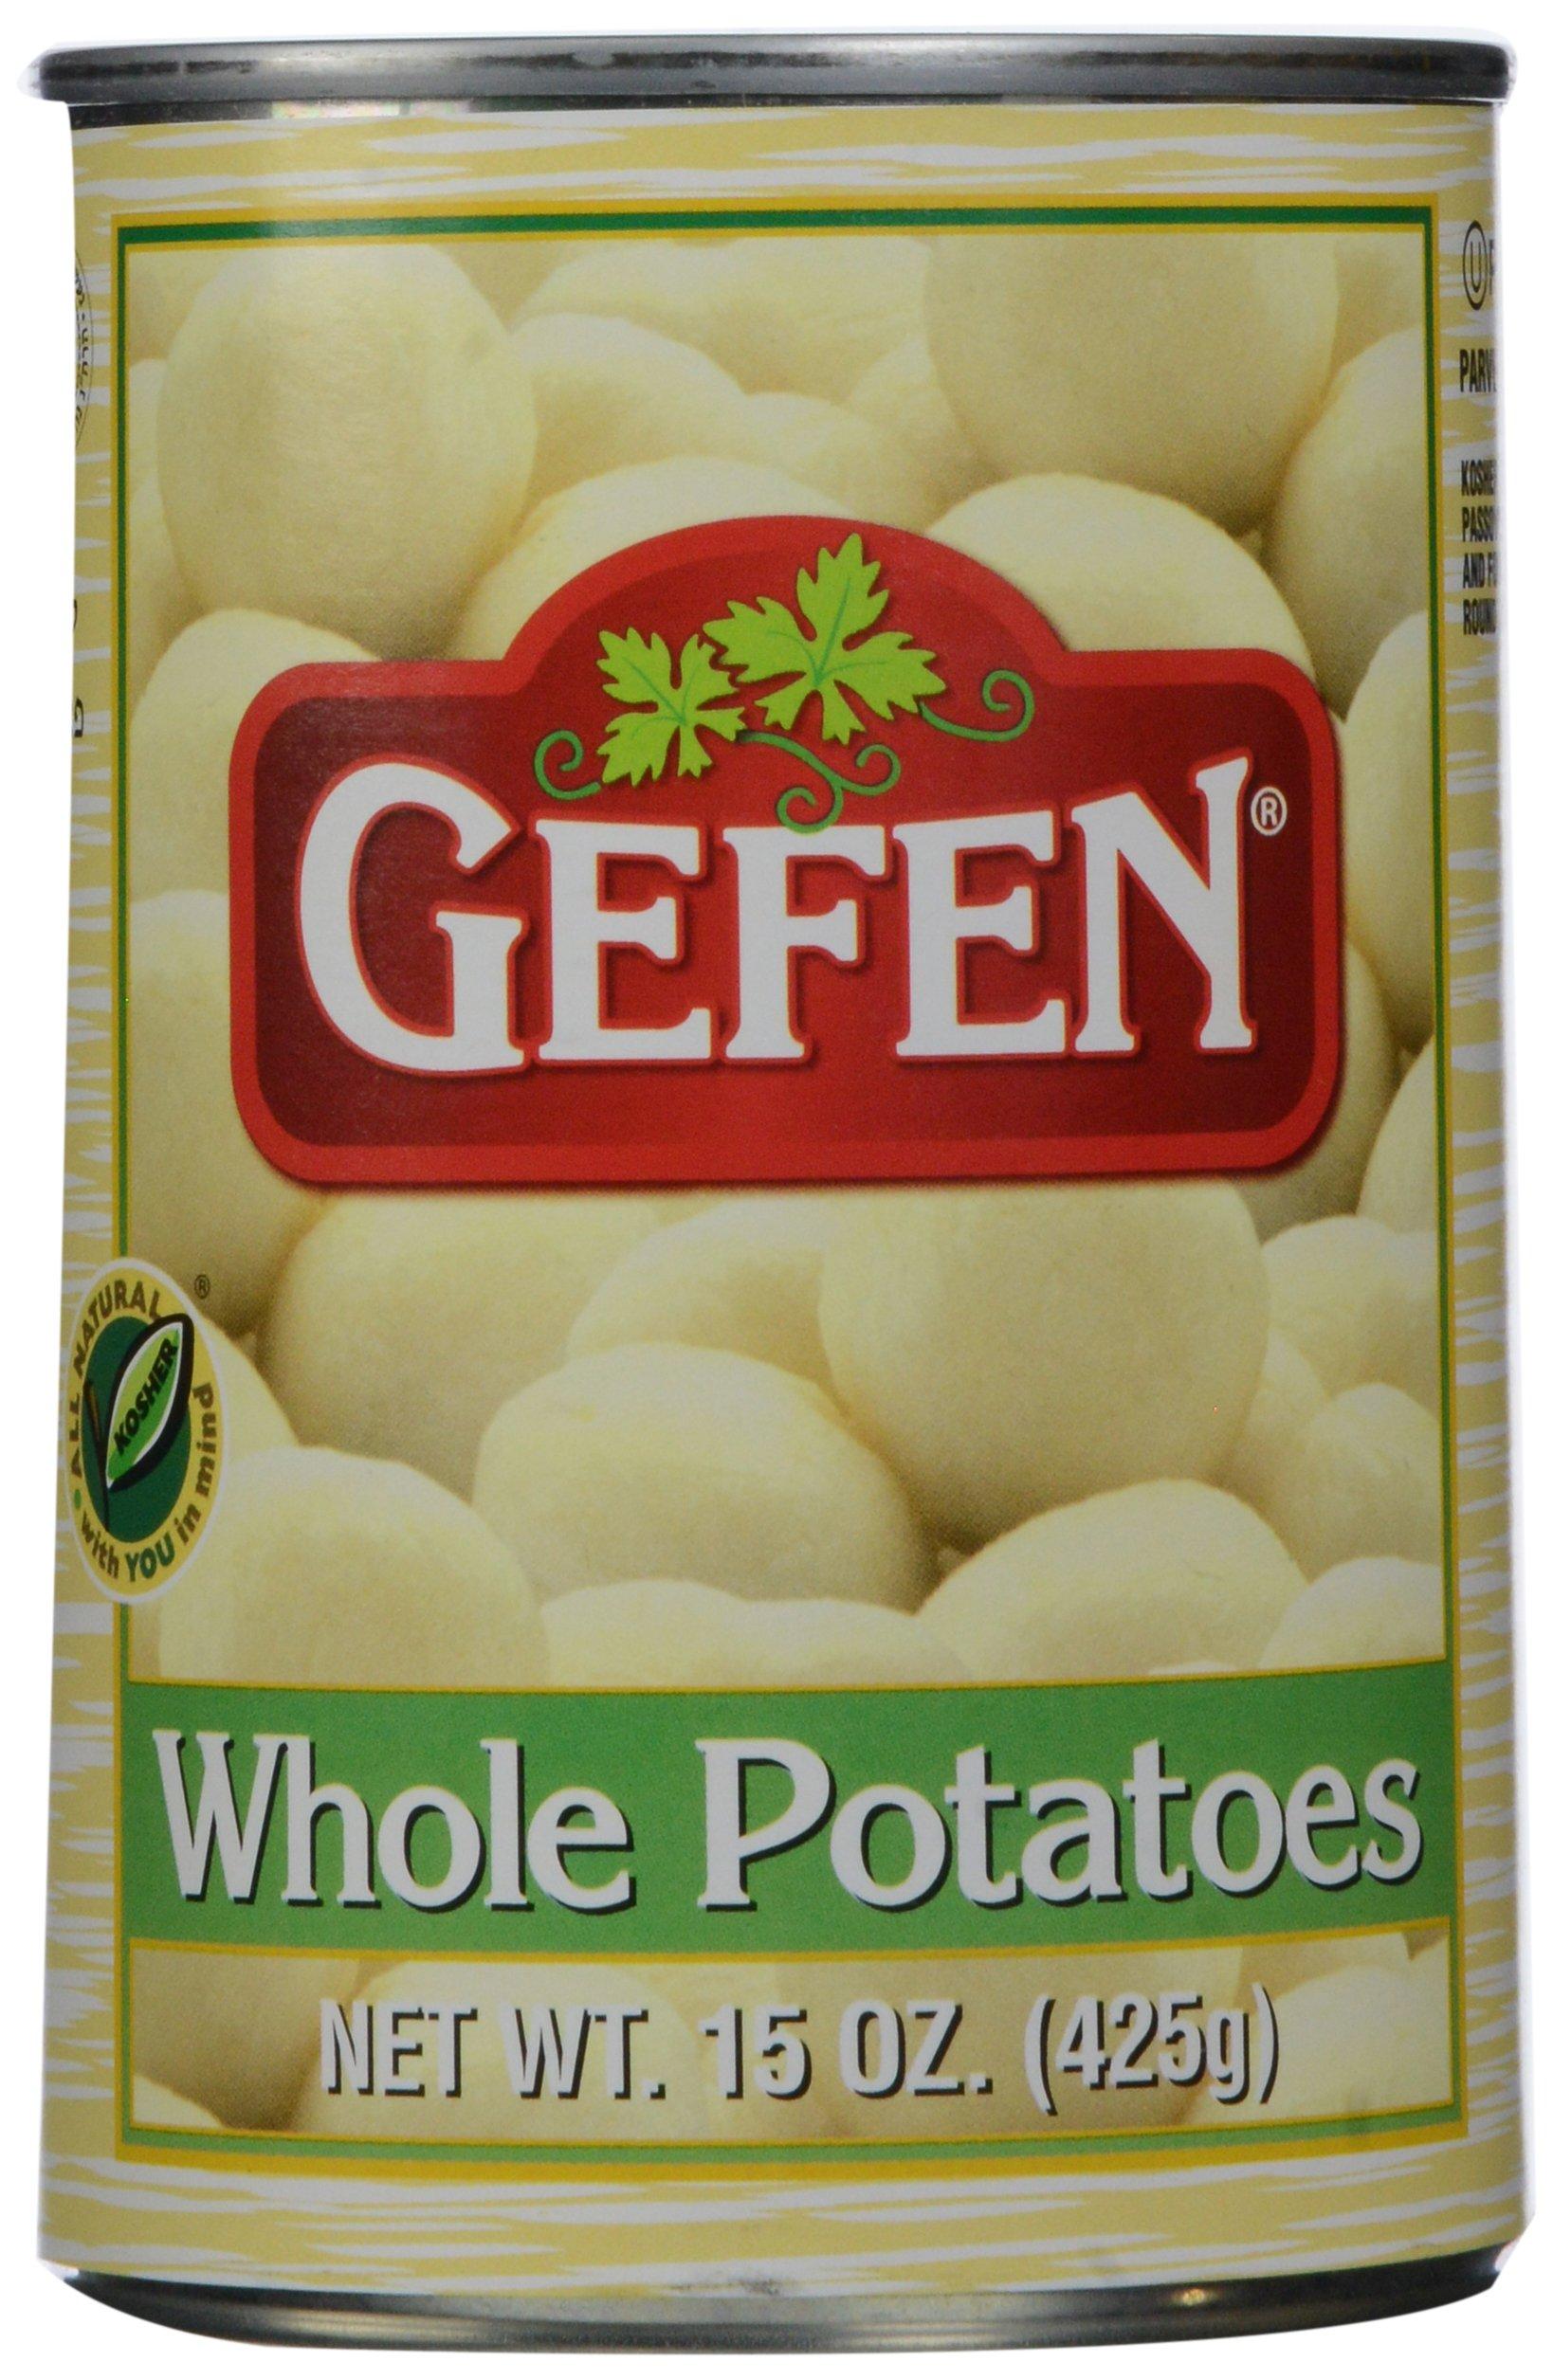 Gefen Whole Potatoes, 15 oz